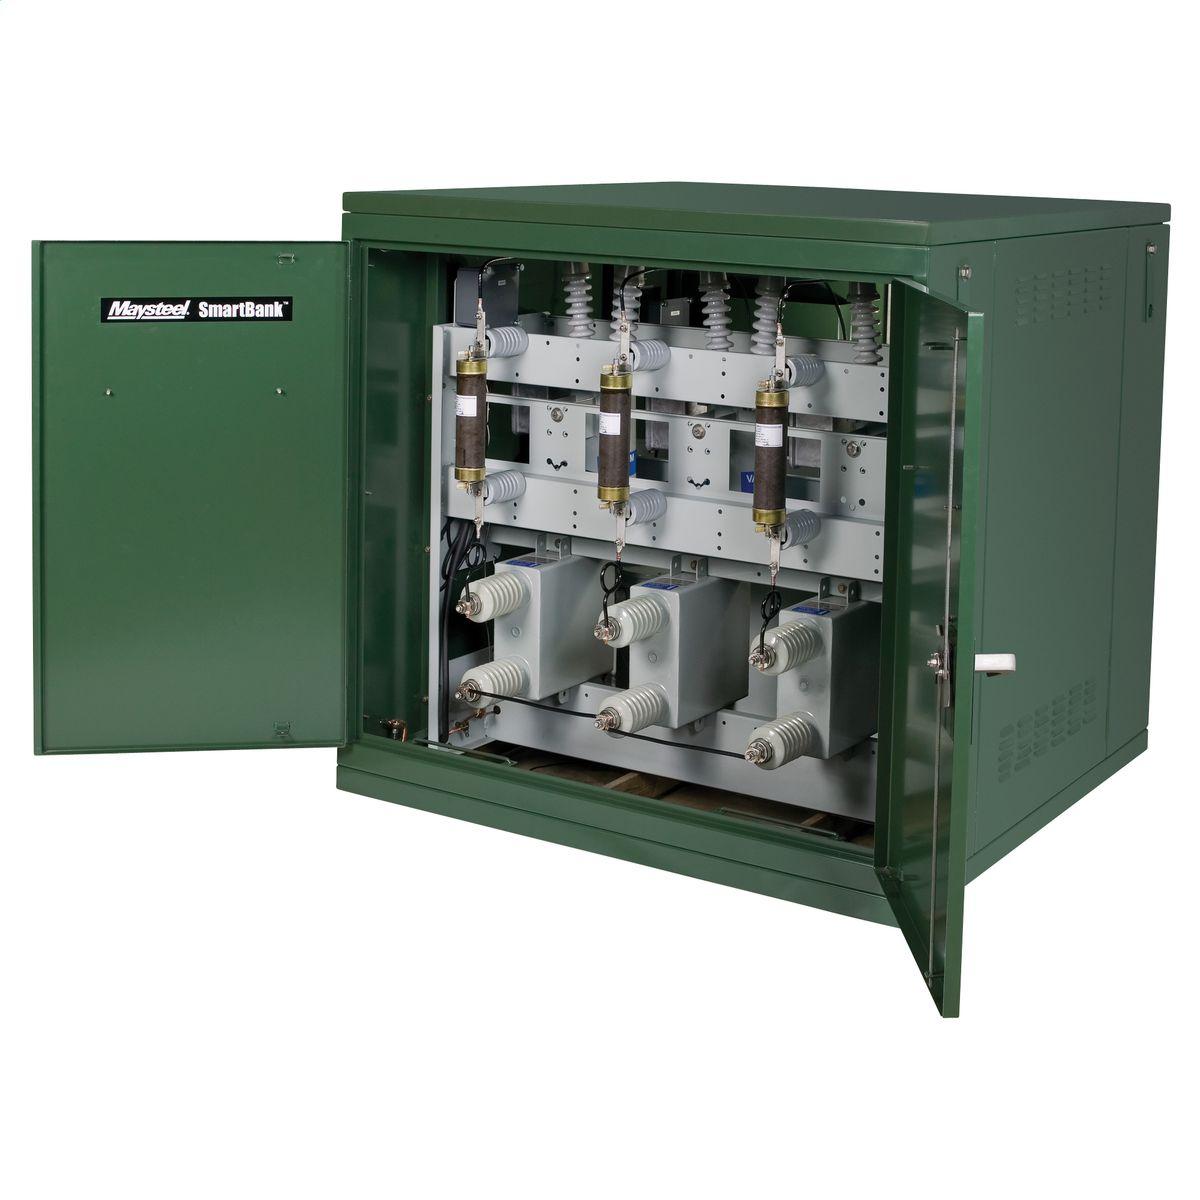 Medium voltage pad mount electrical enclosure